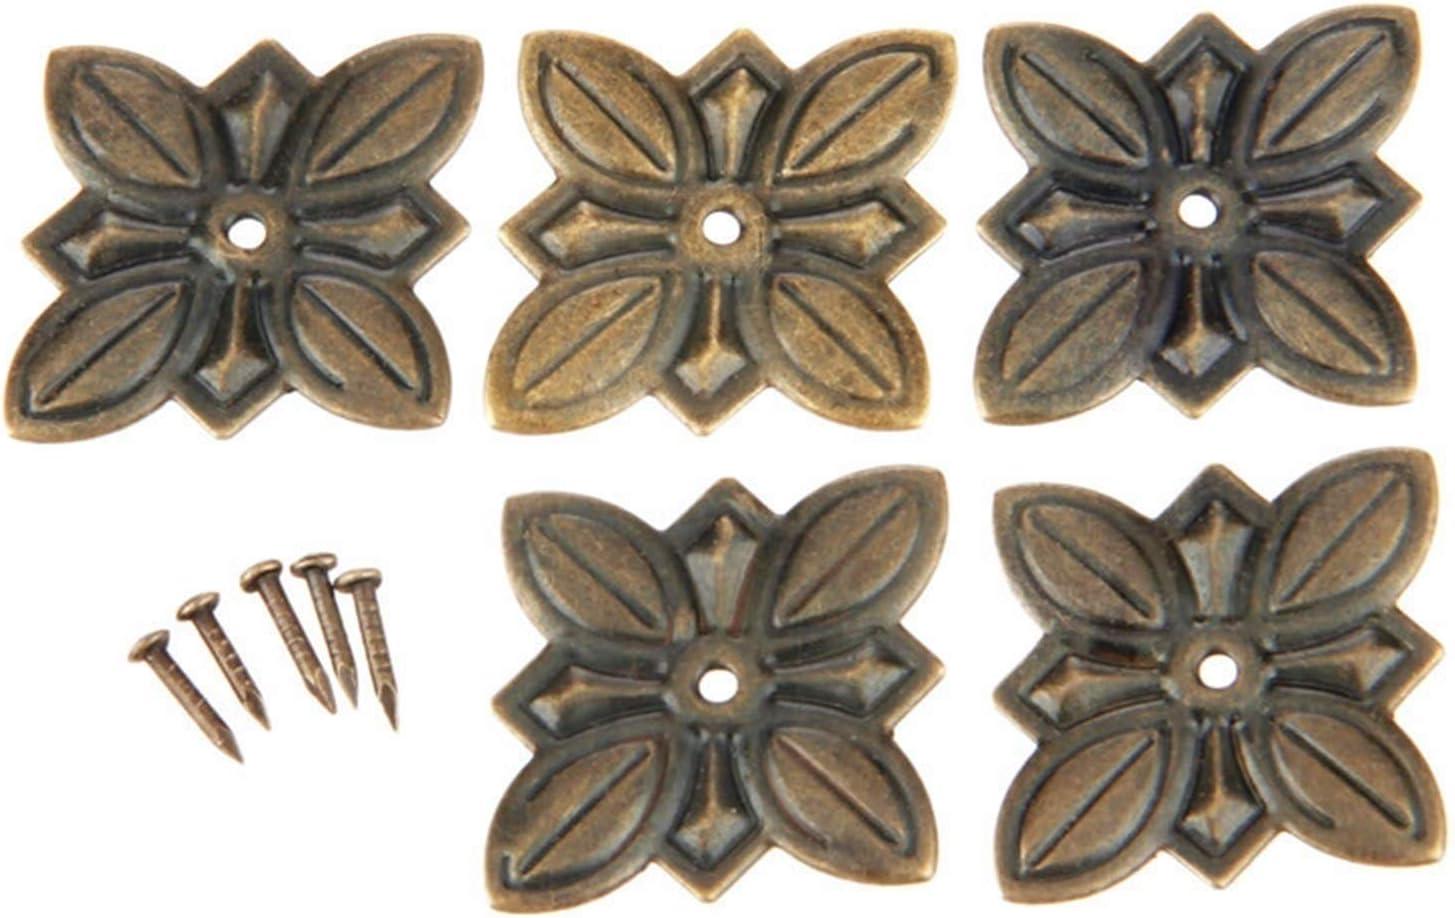 QJKW Thumbtack 50Pcs New Shipping Free Bronze Max 56% OFF Interior Nails Door Sofa Jewelry Box